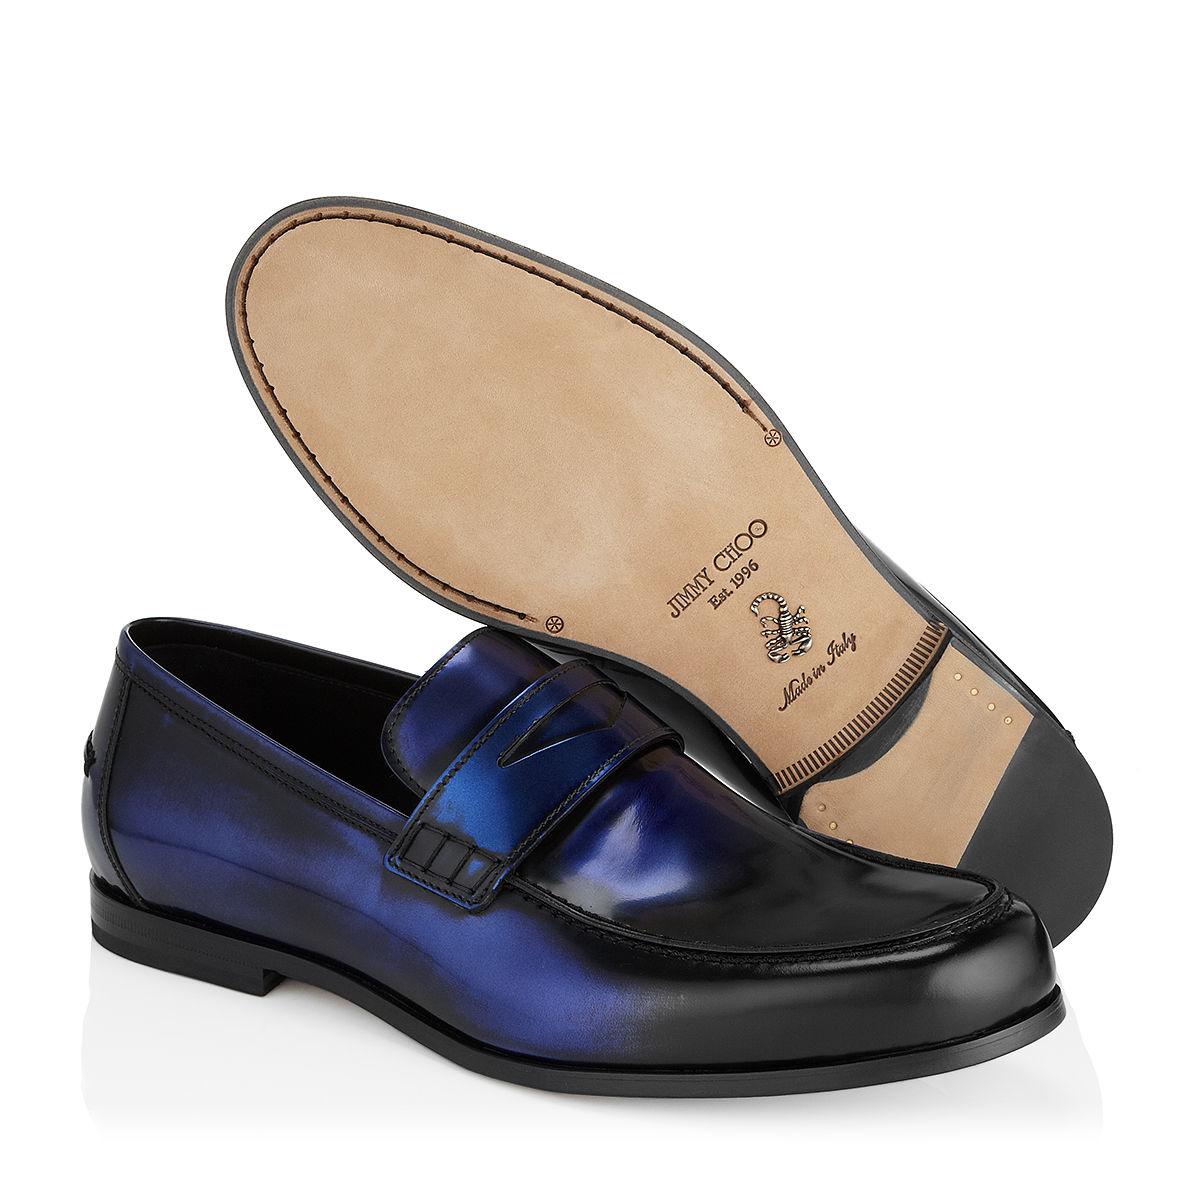 Darblay loafers - Blue Jimmy Choo London Cheap Clearance Store Cheap Big Sale Cheap Fashionable Clearance Low Price Clearance Hot Sale ZUoqv